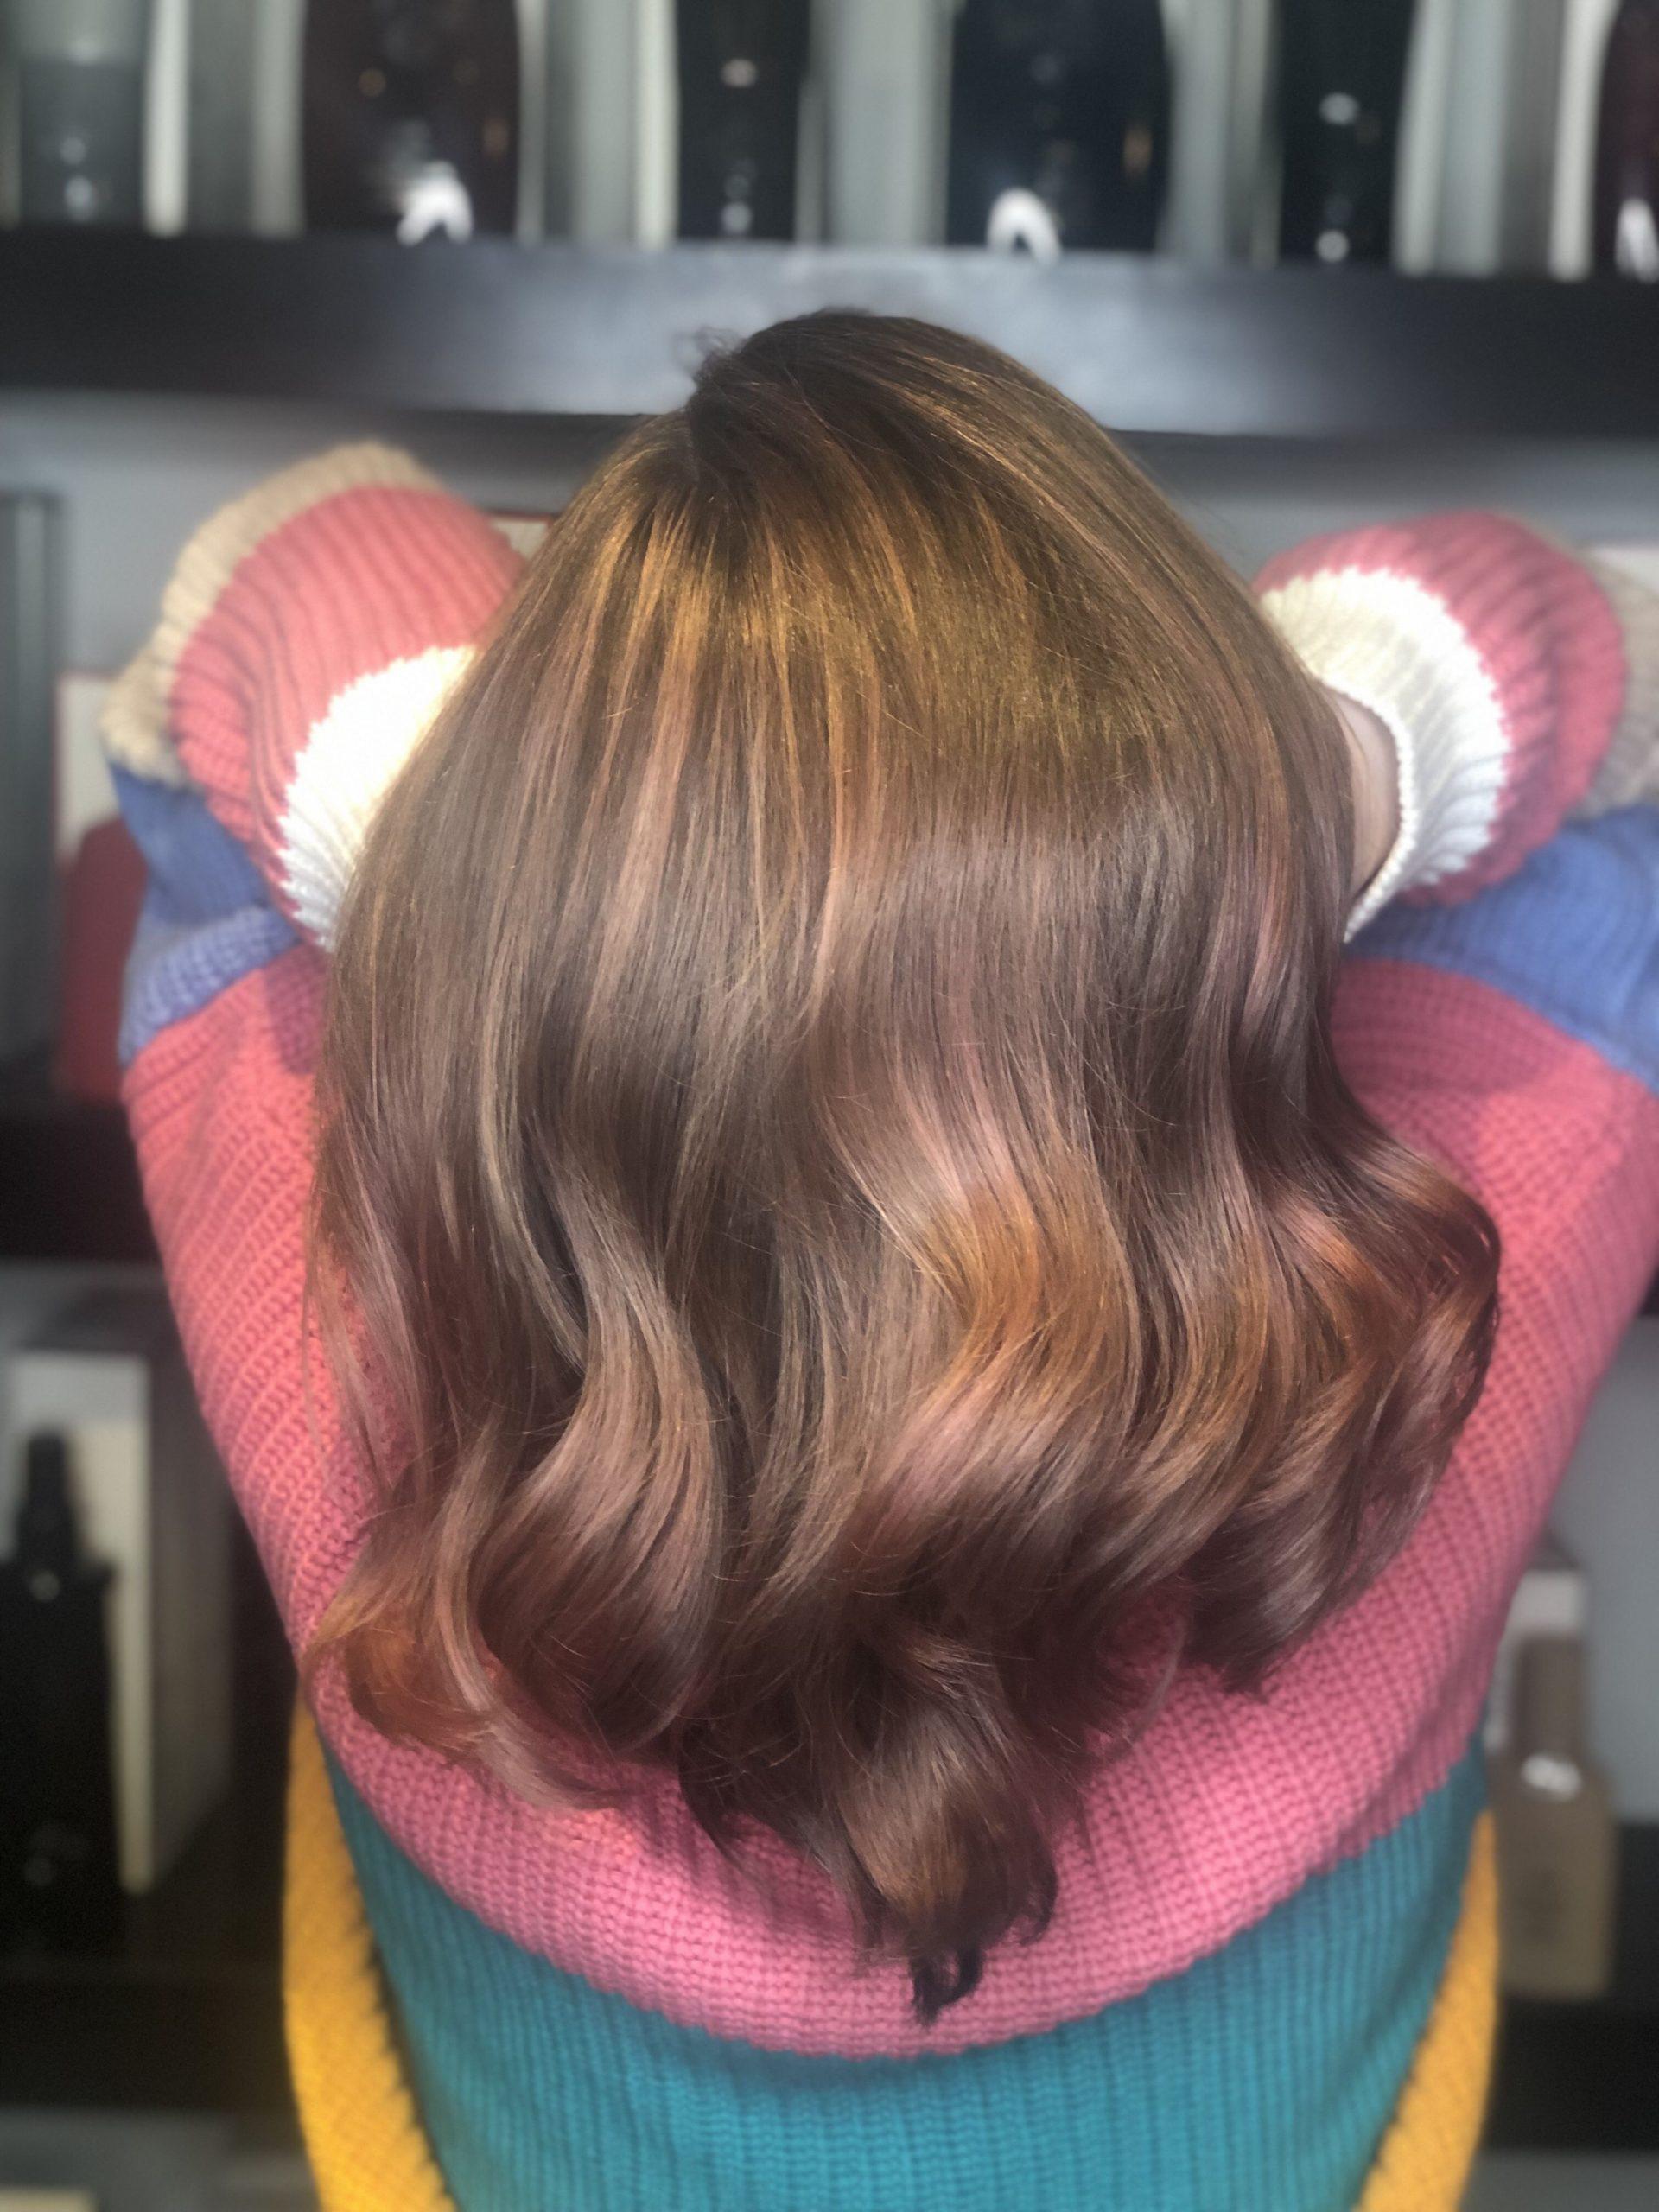 Park Art My WordPress Blog_Heads Up Hair Salon Natick